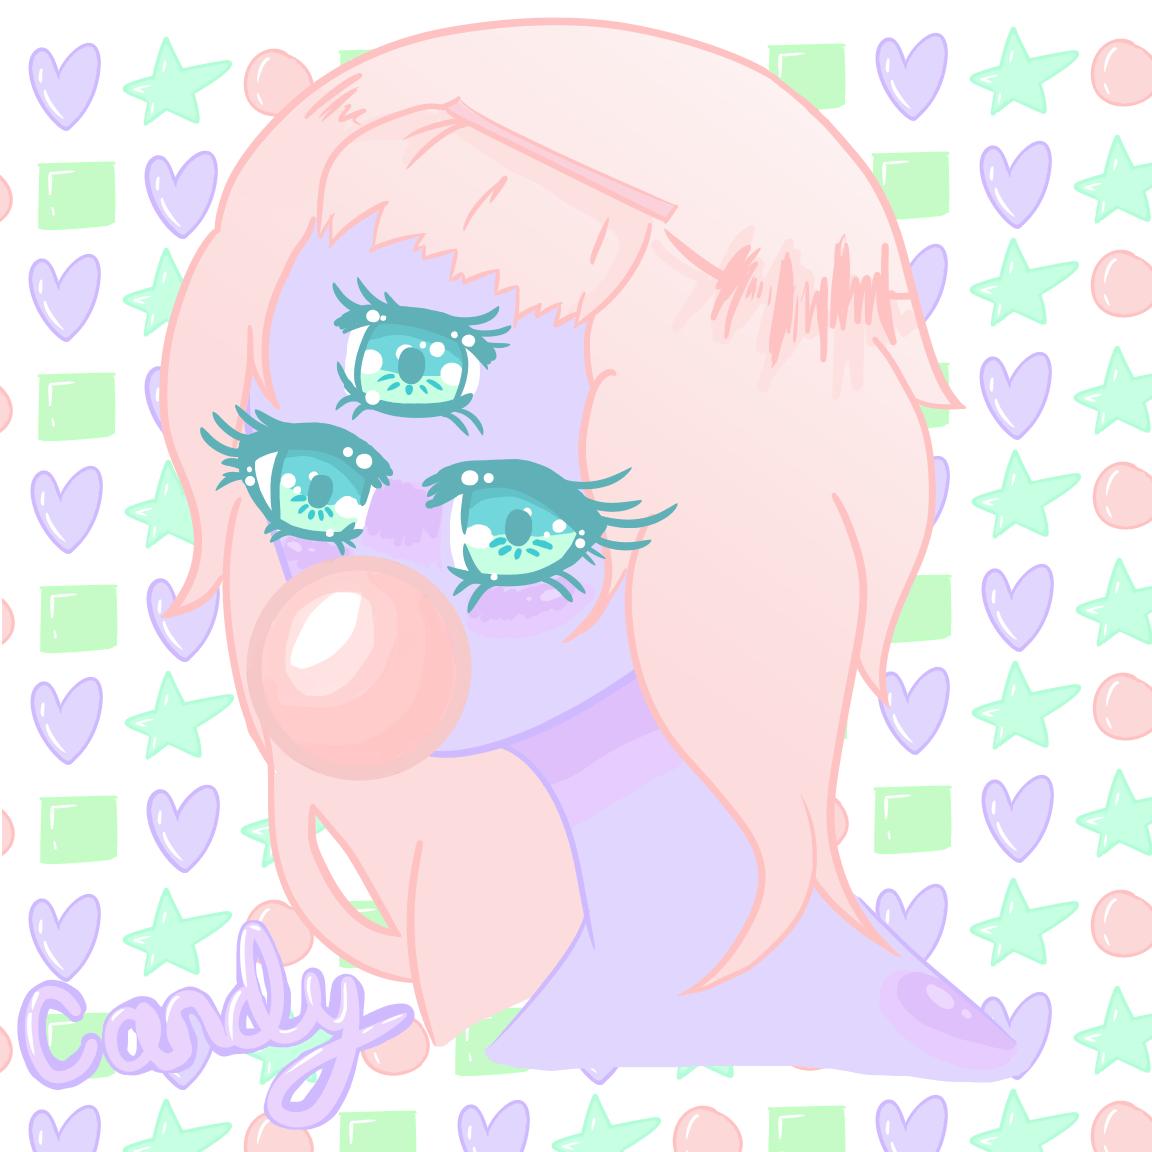 hight resolution of candy kawaii anime girl monster three eyed drawing digital art